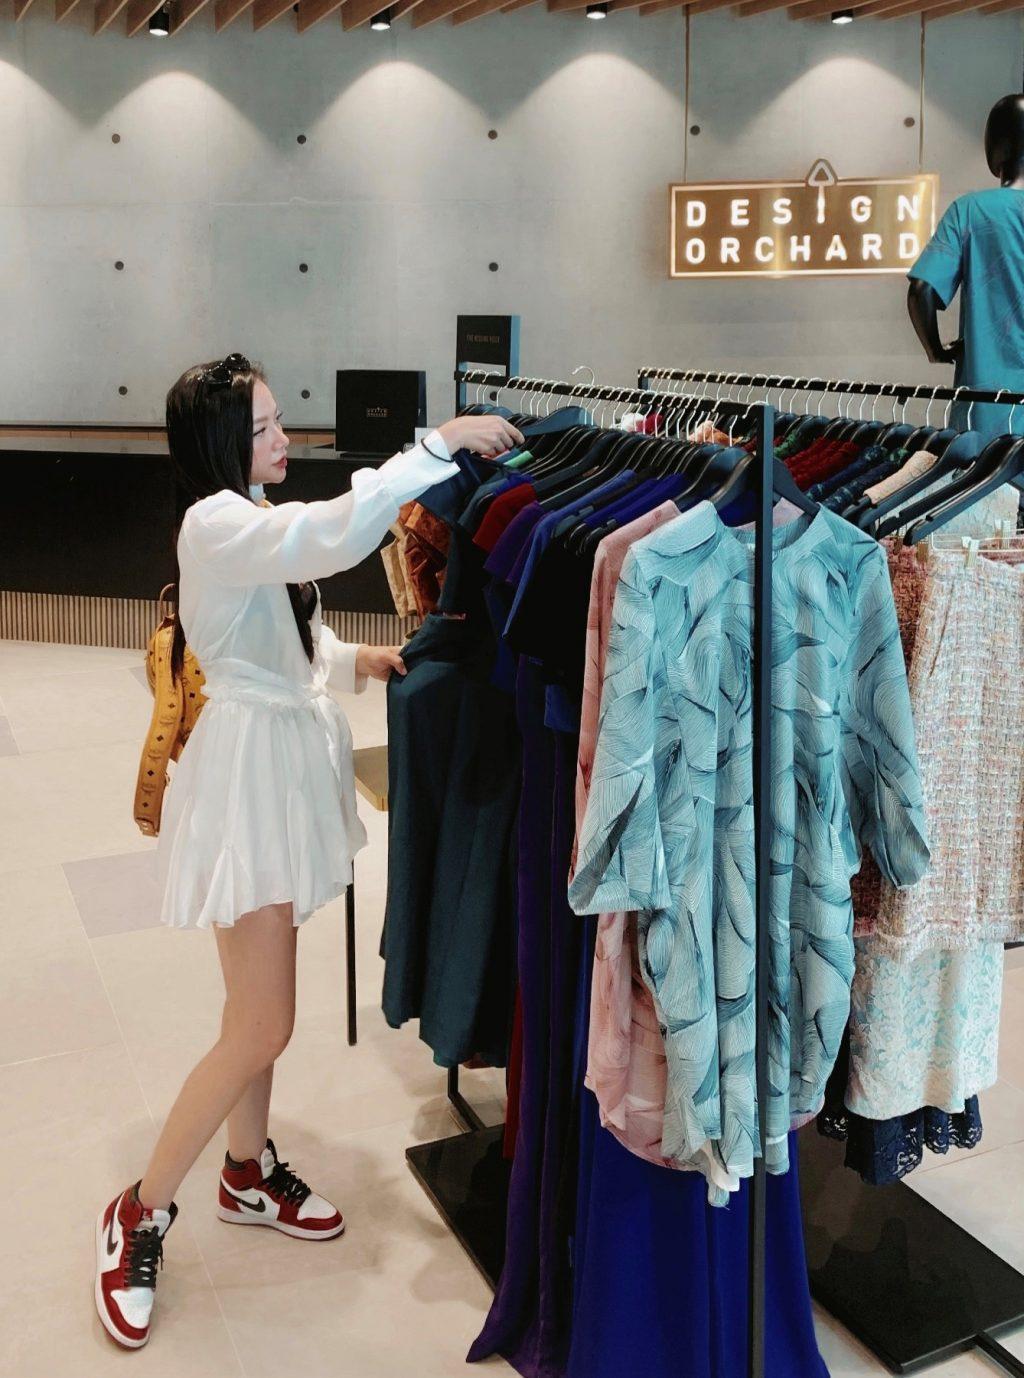 mua sắm singapore cùng băng di tại design orchard